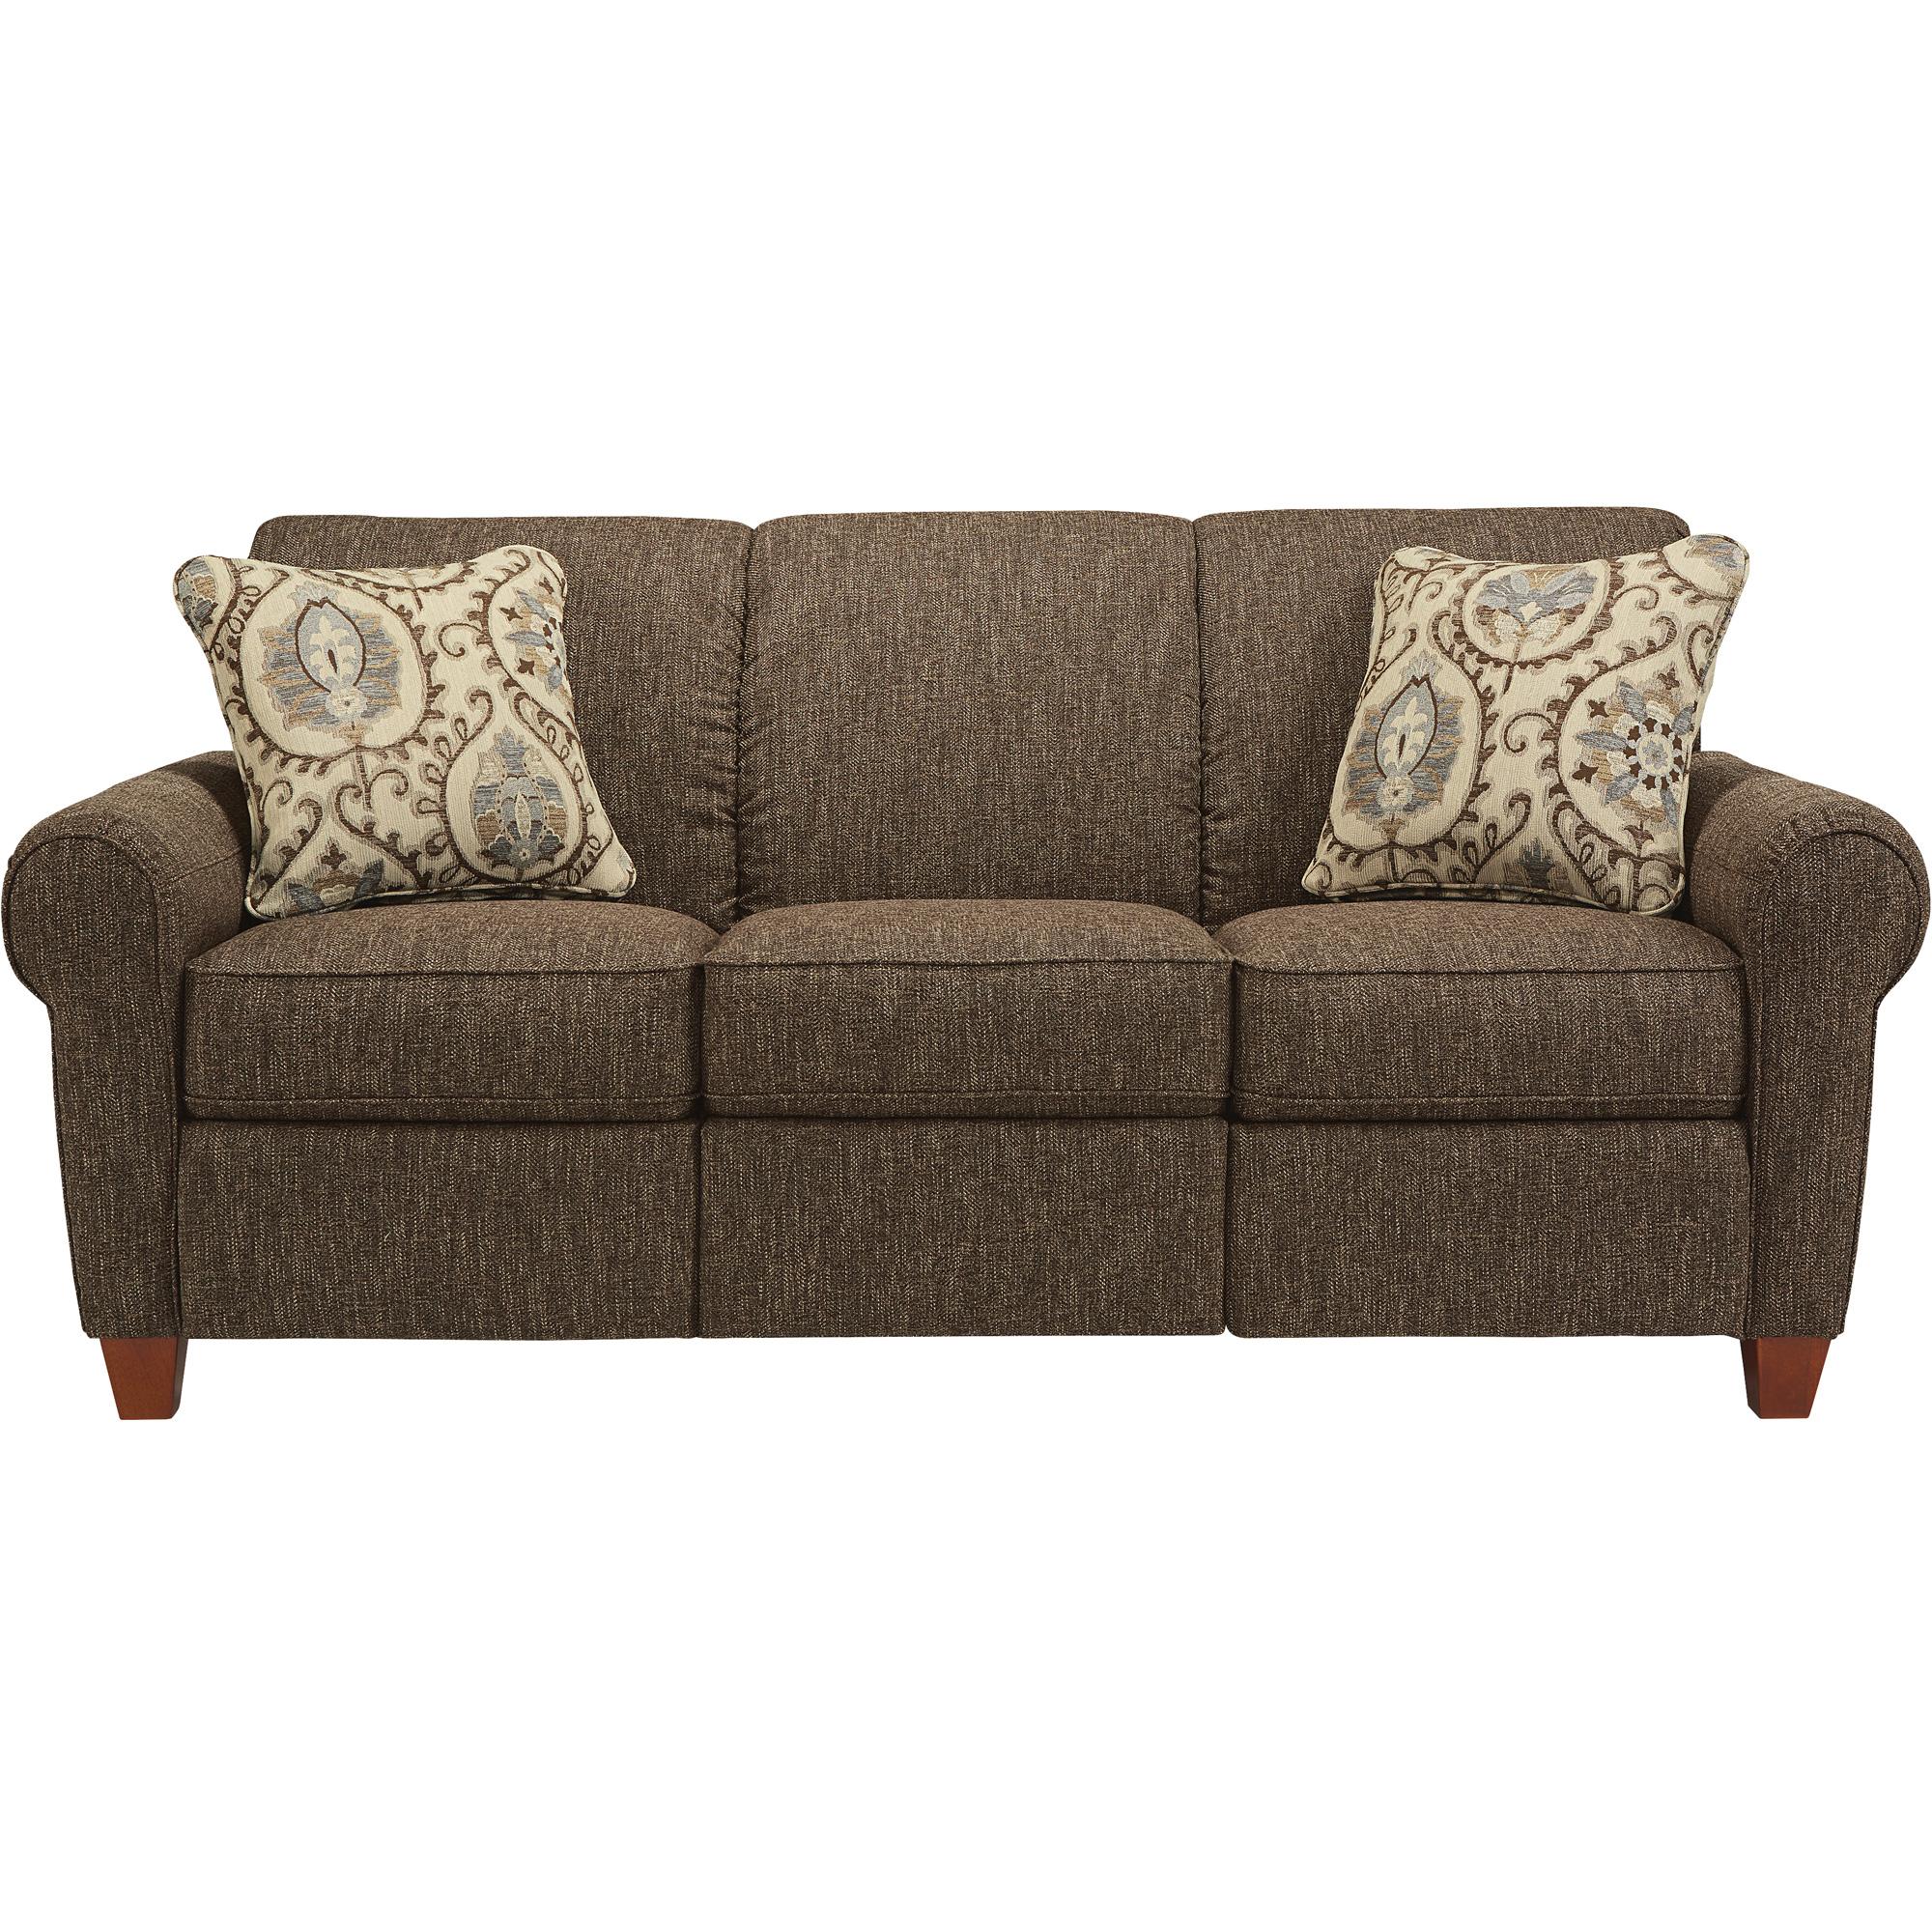 La-Z-Boy | Bennett Mocha Reclining Sofa